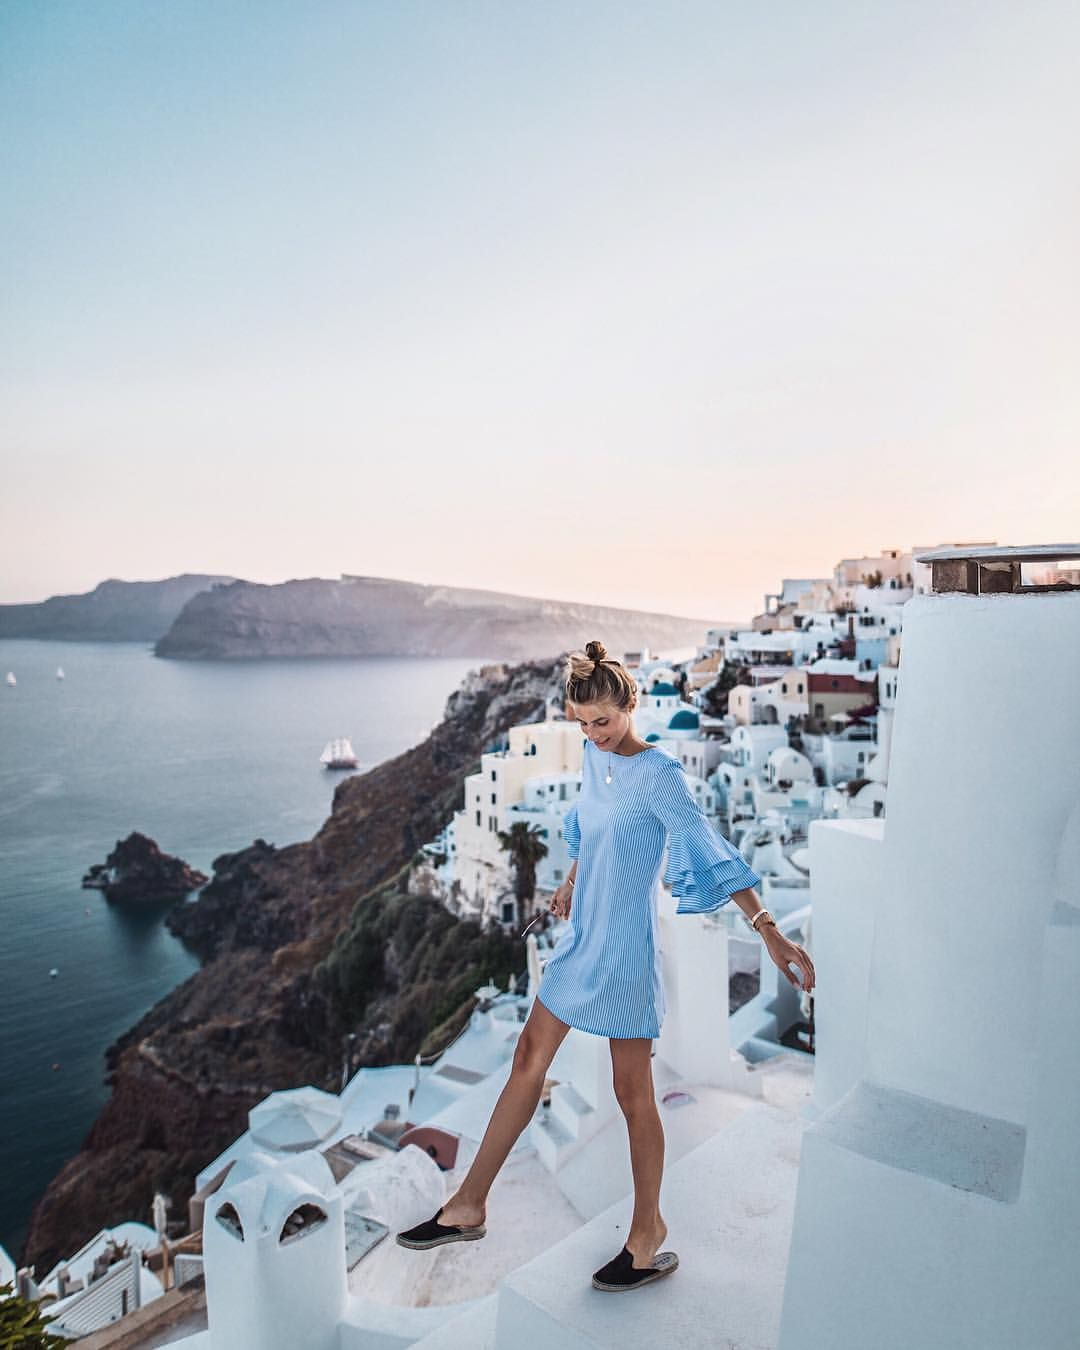 33 6k Likes 388 Comments Debi Flugge Vegan Diet Debiflue On Instagram Happiest When Dancing On Rooftops Manebi Manebi Santorini Instagram Fotoideen